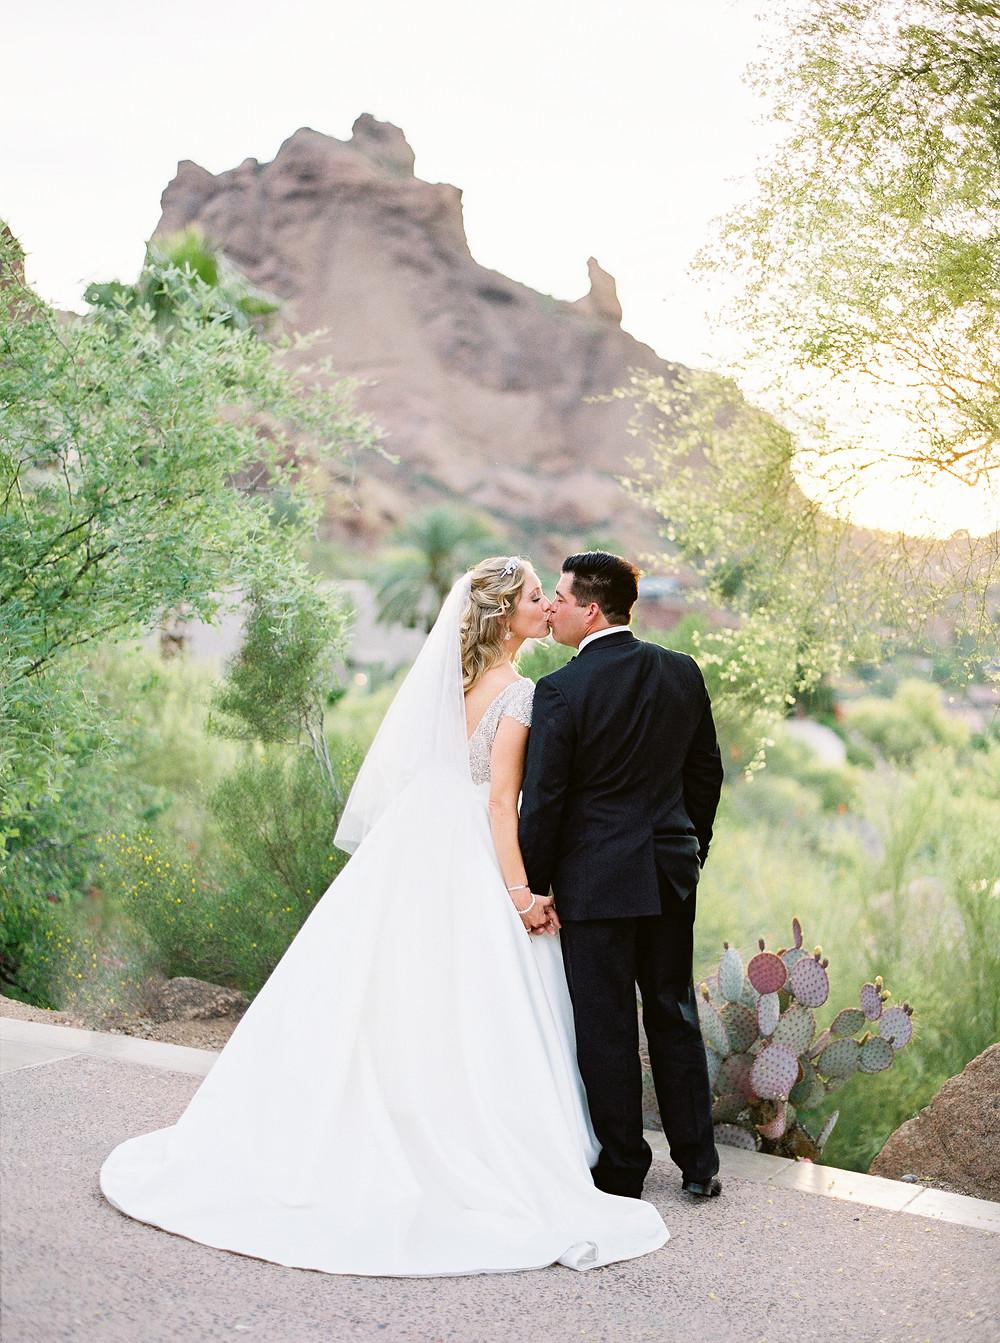 Sanctuary wedding photography